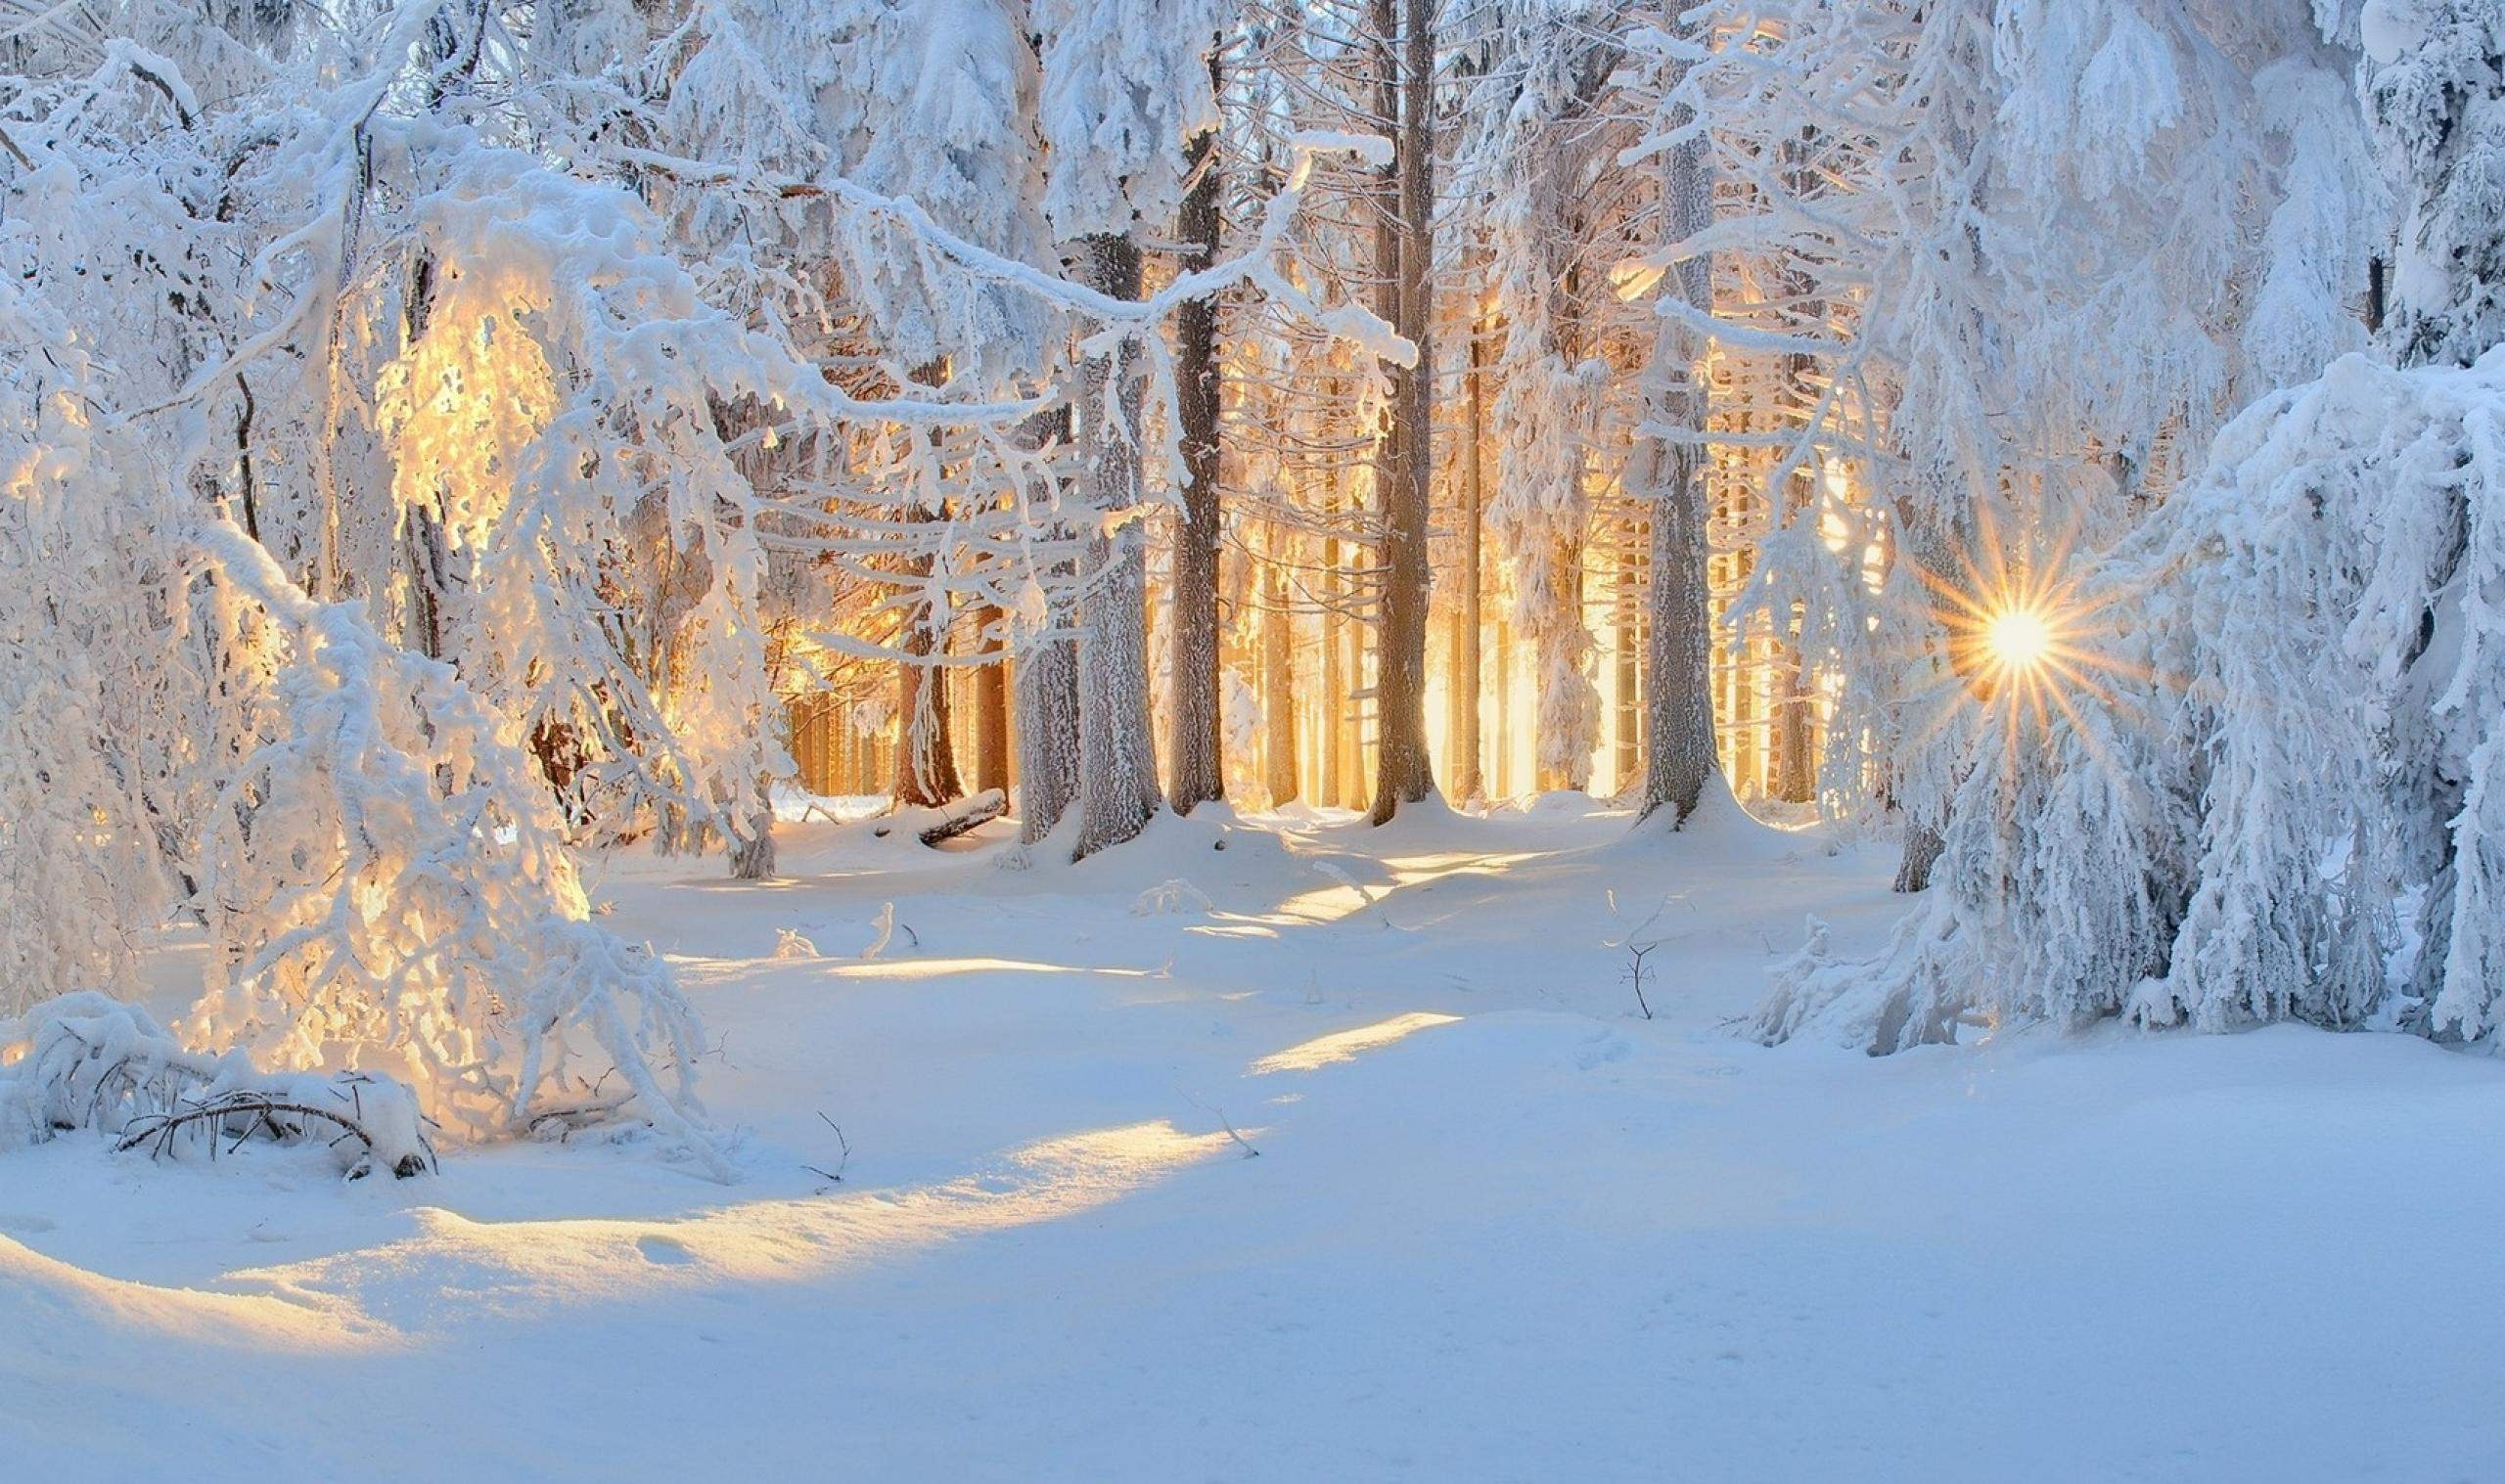 sneg-oboi-zima-winter-Favim.ru-4795775